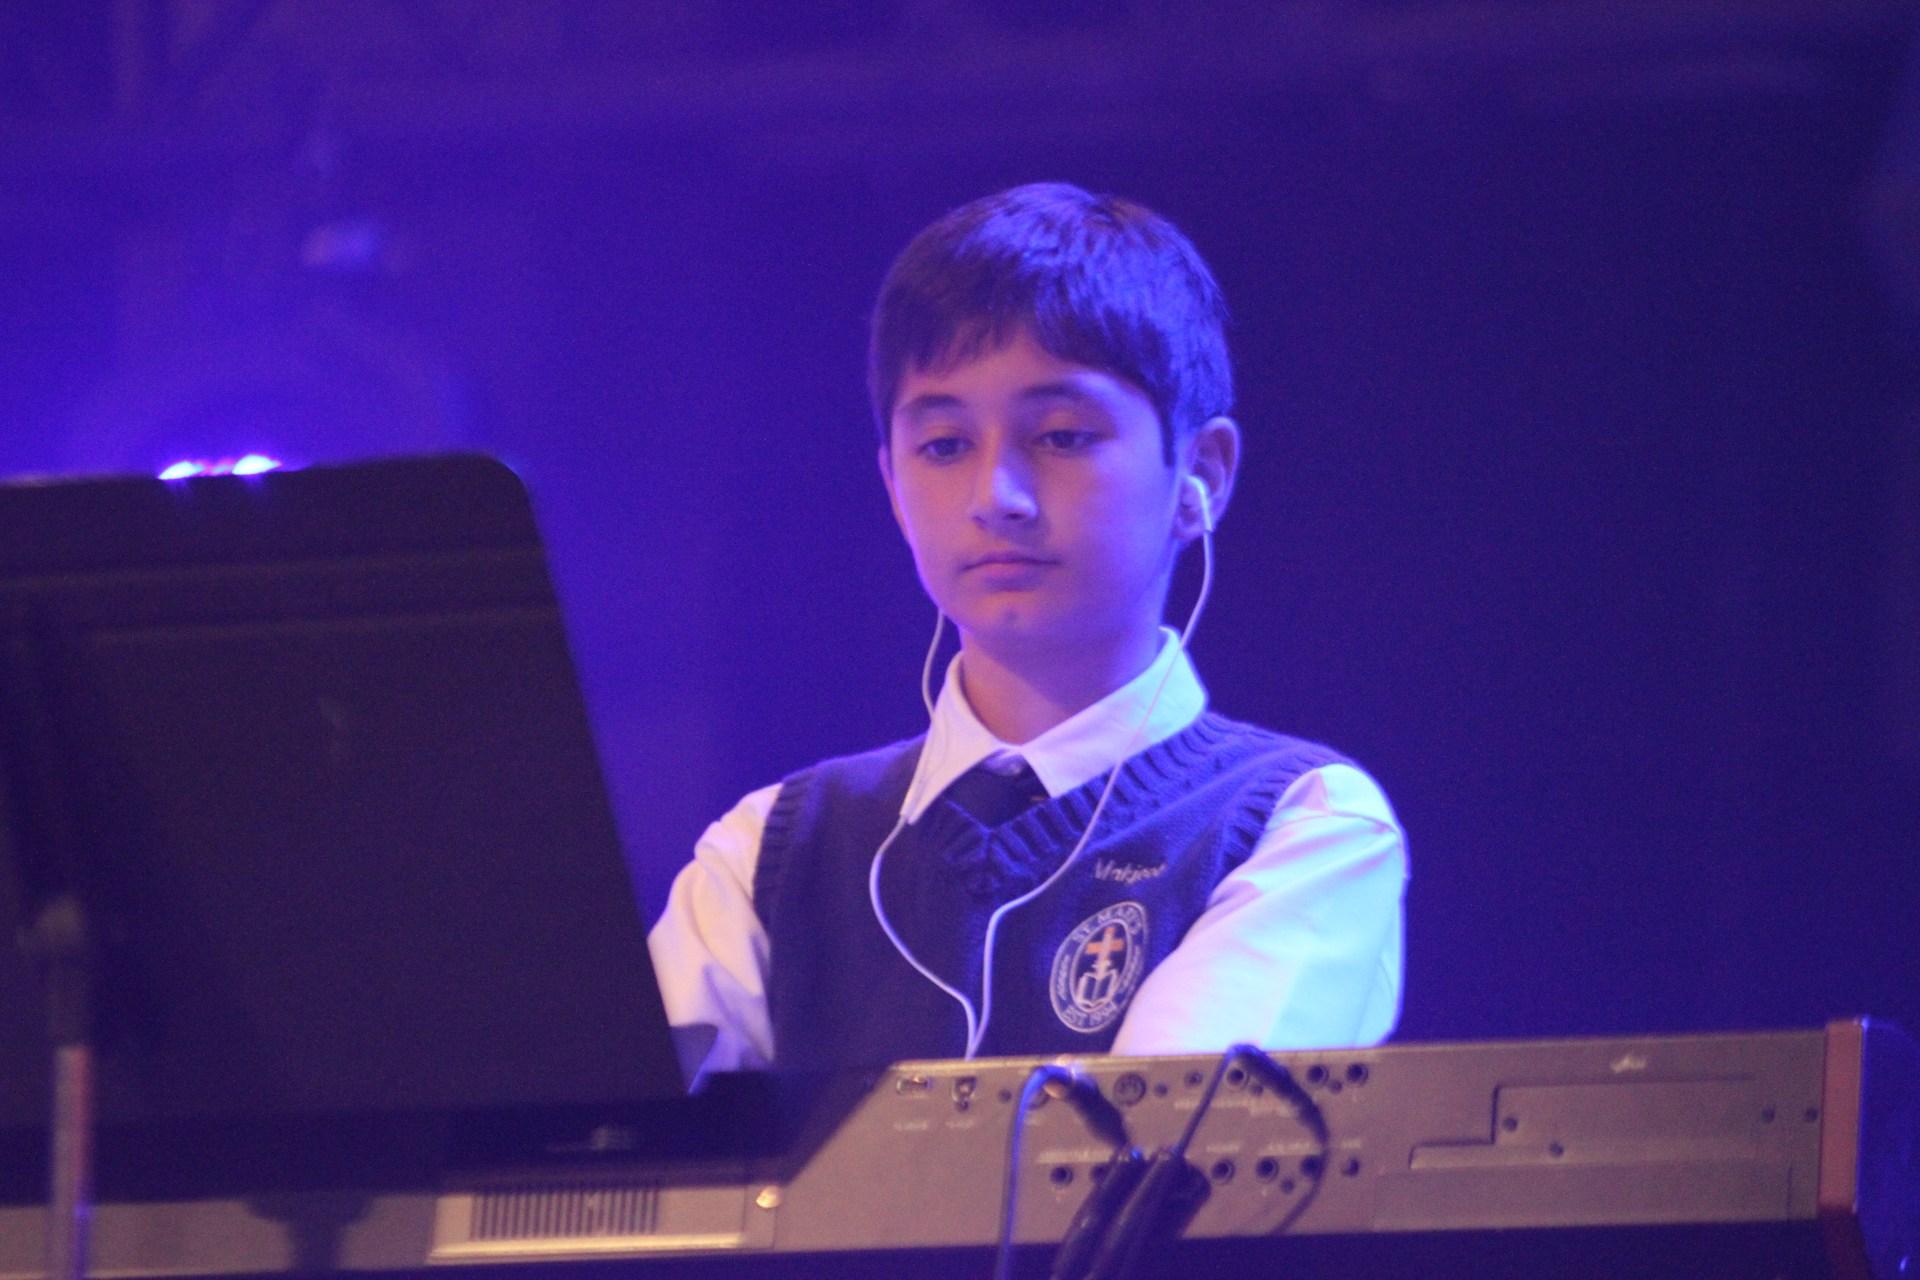 boy playing keyboard